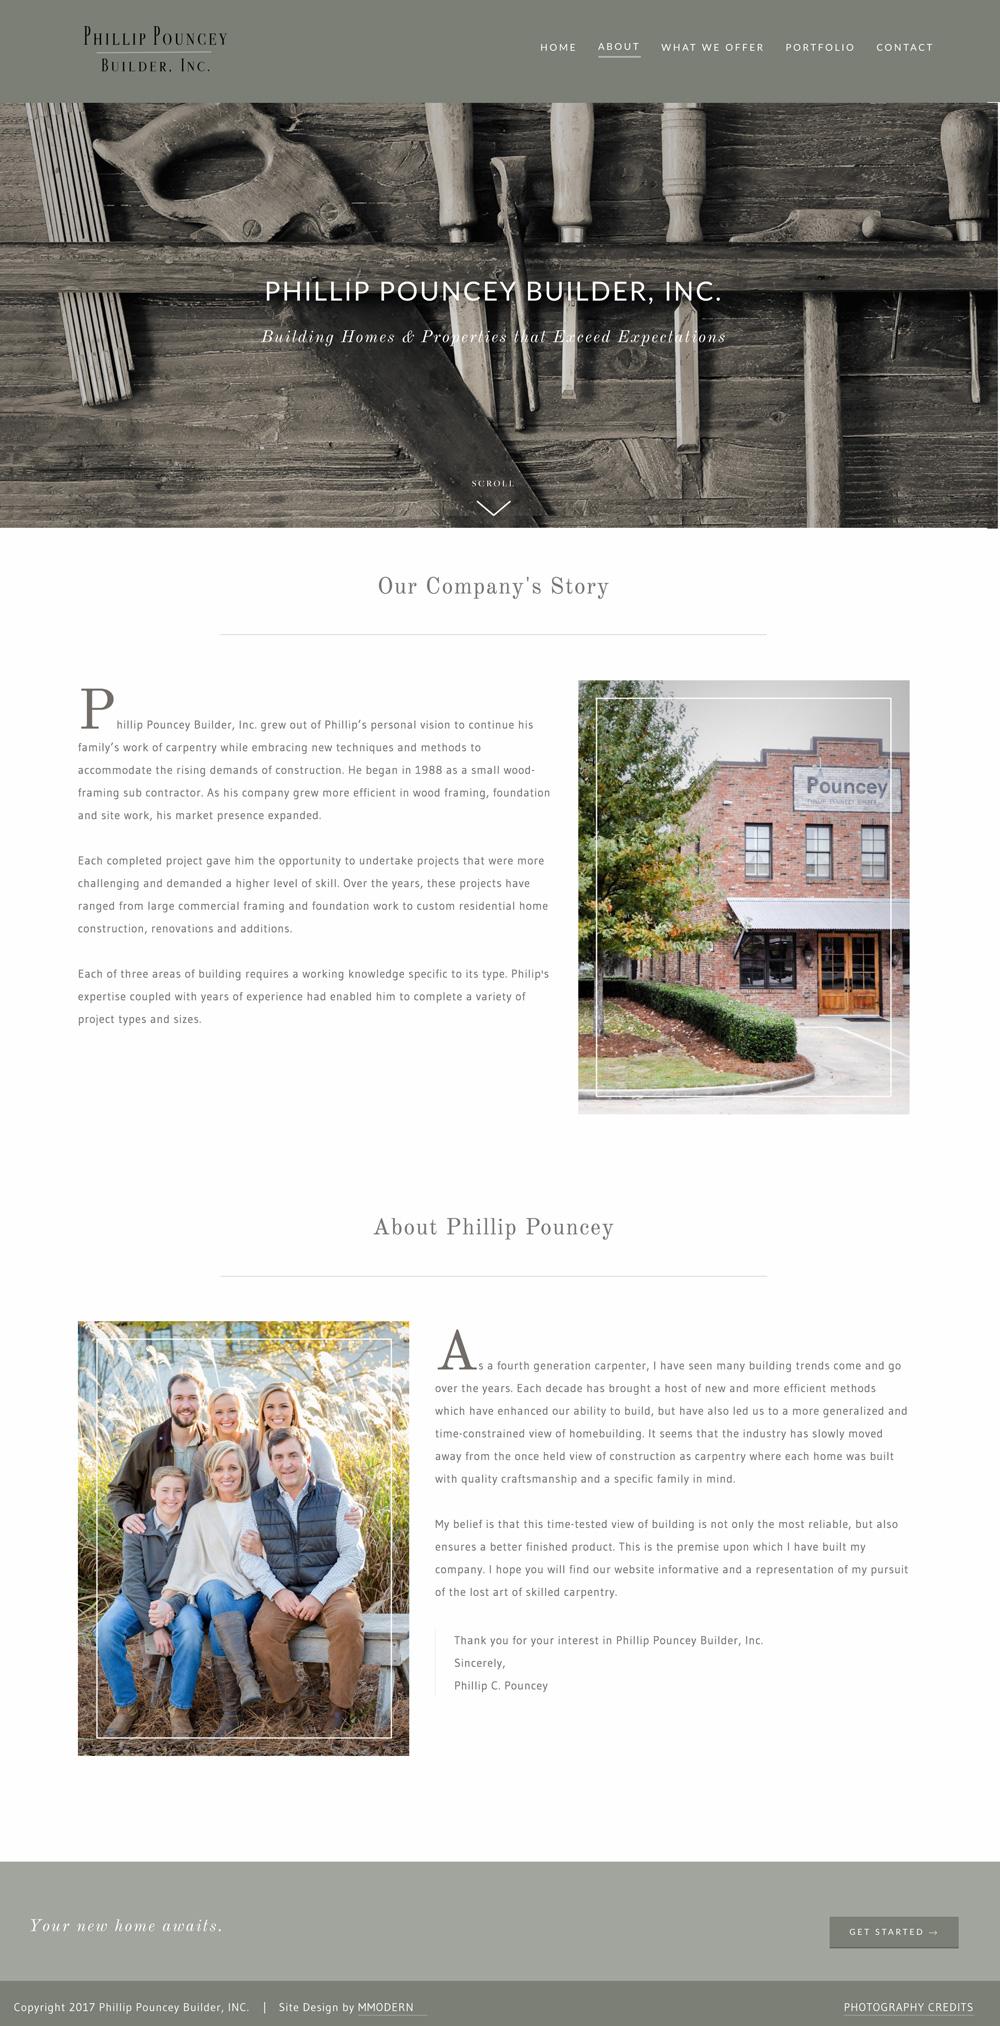 sherry-page-2.jpg